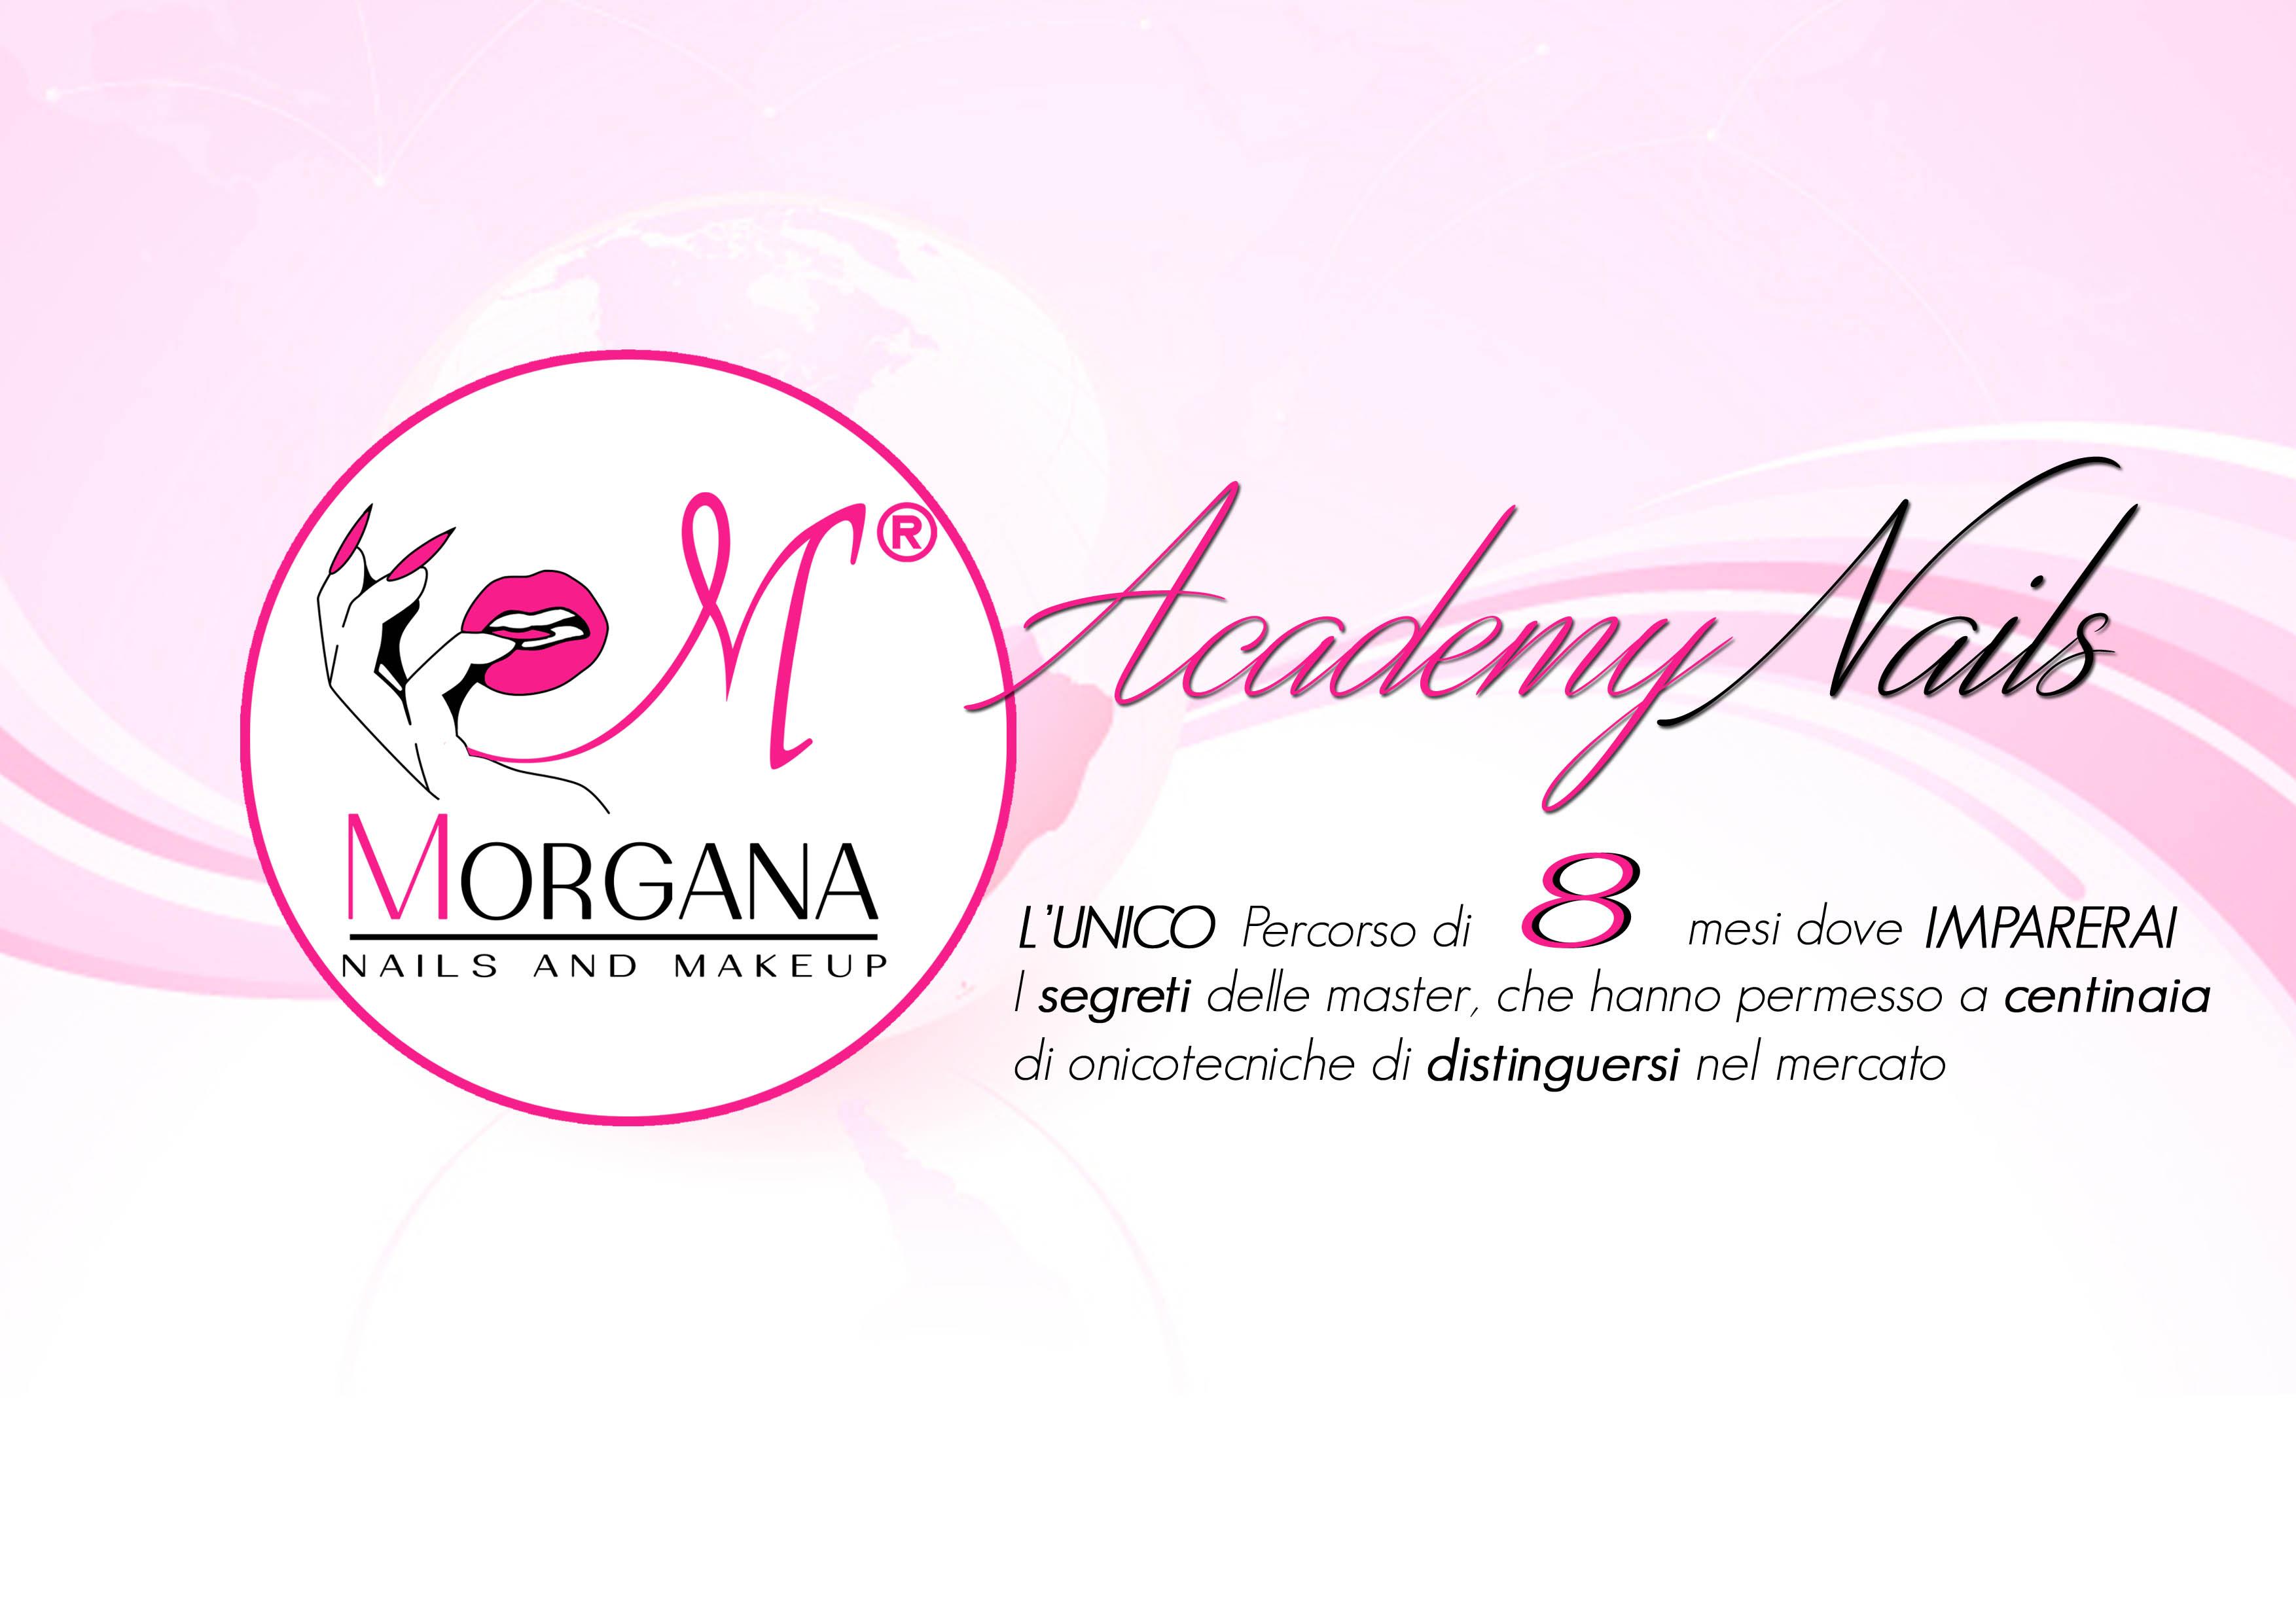 Morgana academy nails